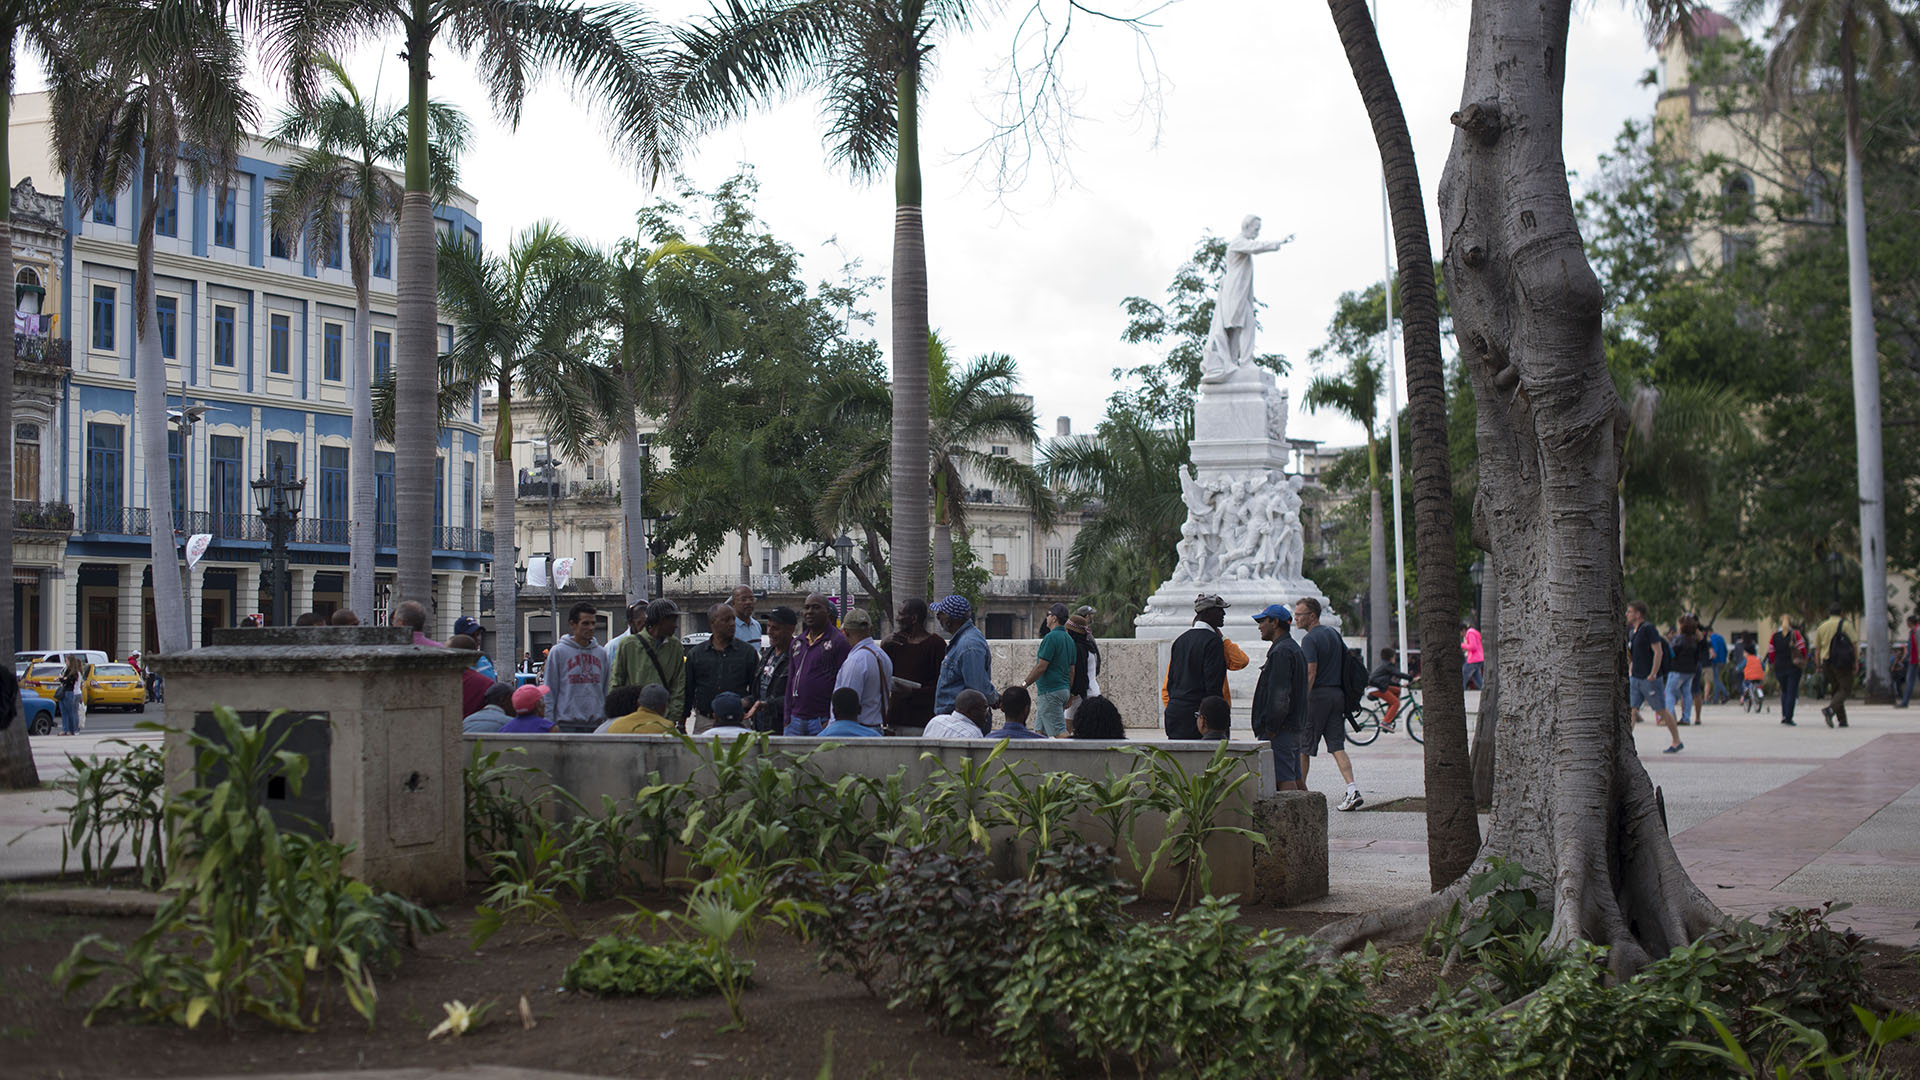 20180115 Havana 099 (1) (1) (1) (1) (1)